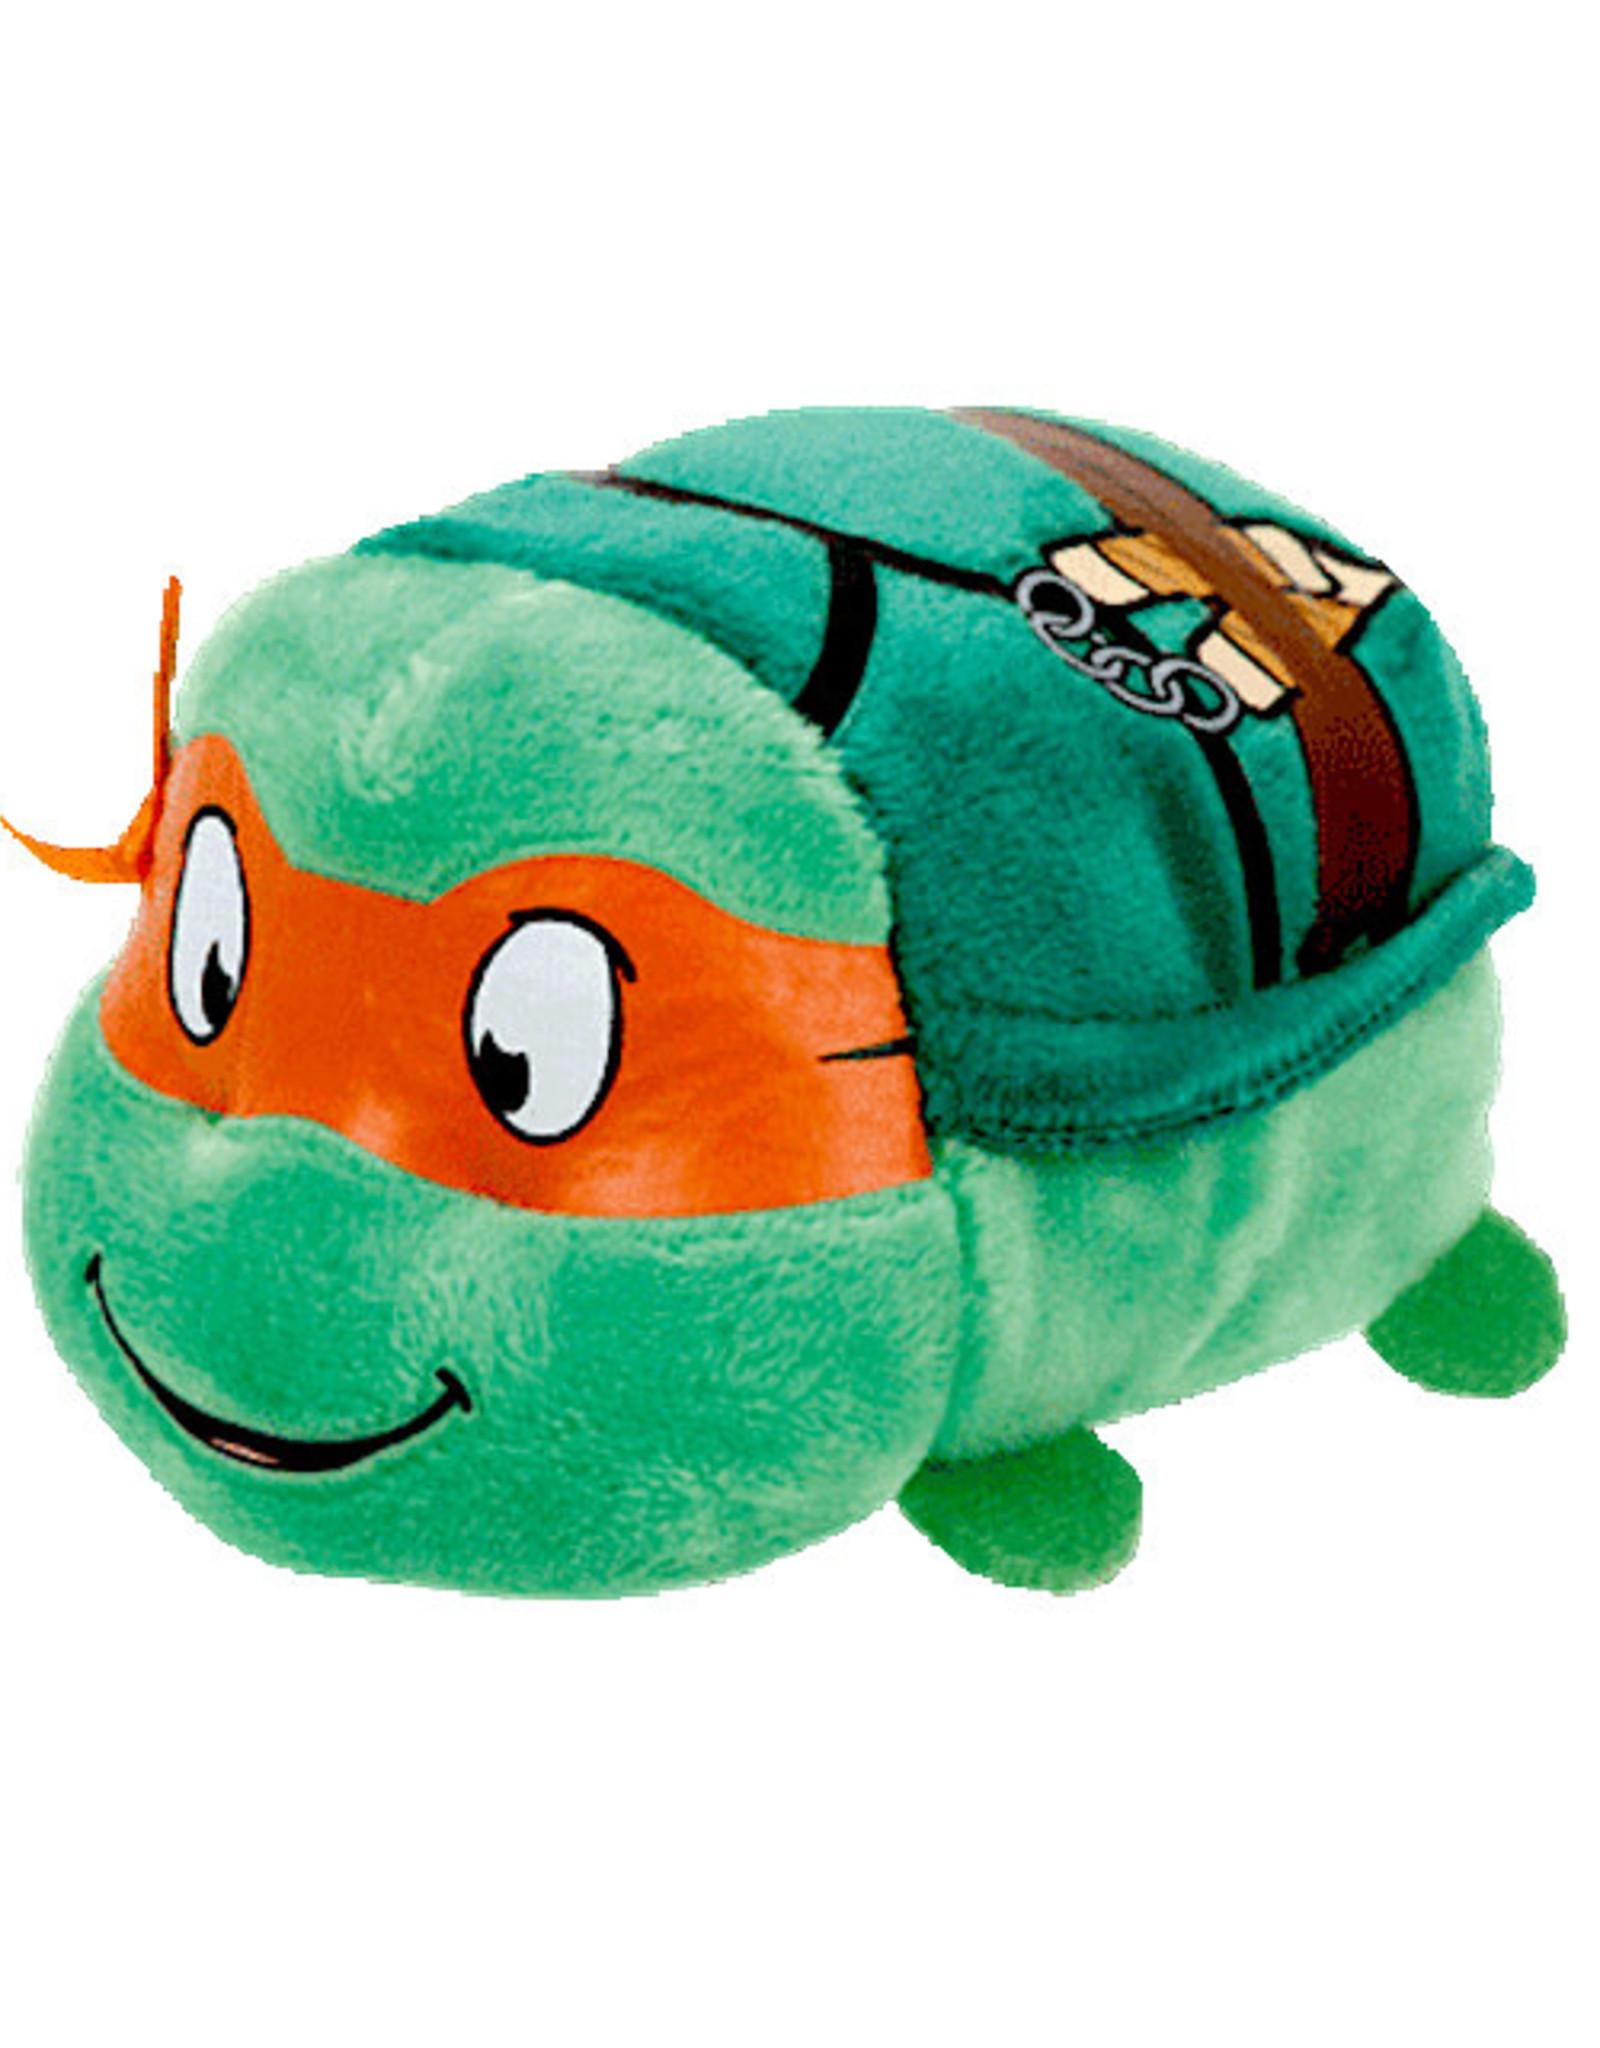 TY Inc. Teeny Ty- Mutant Ninja Turtles